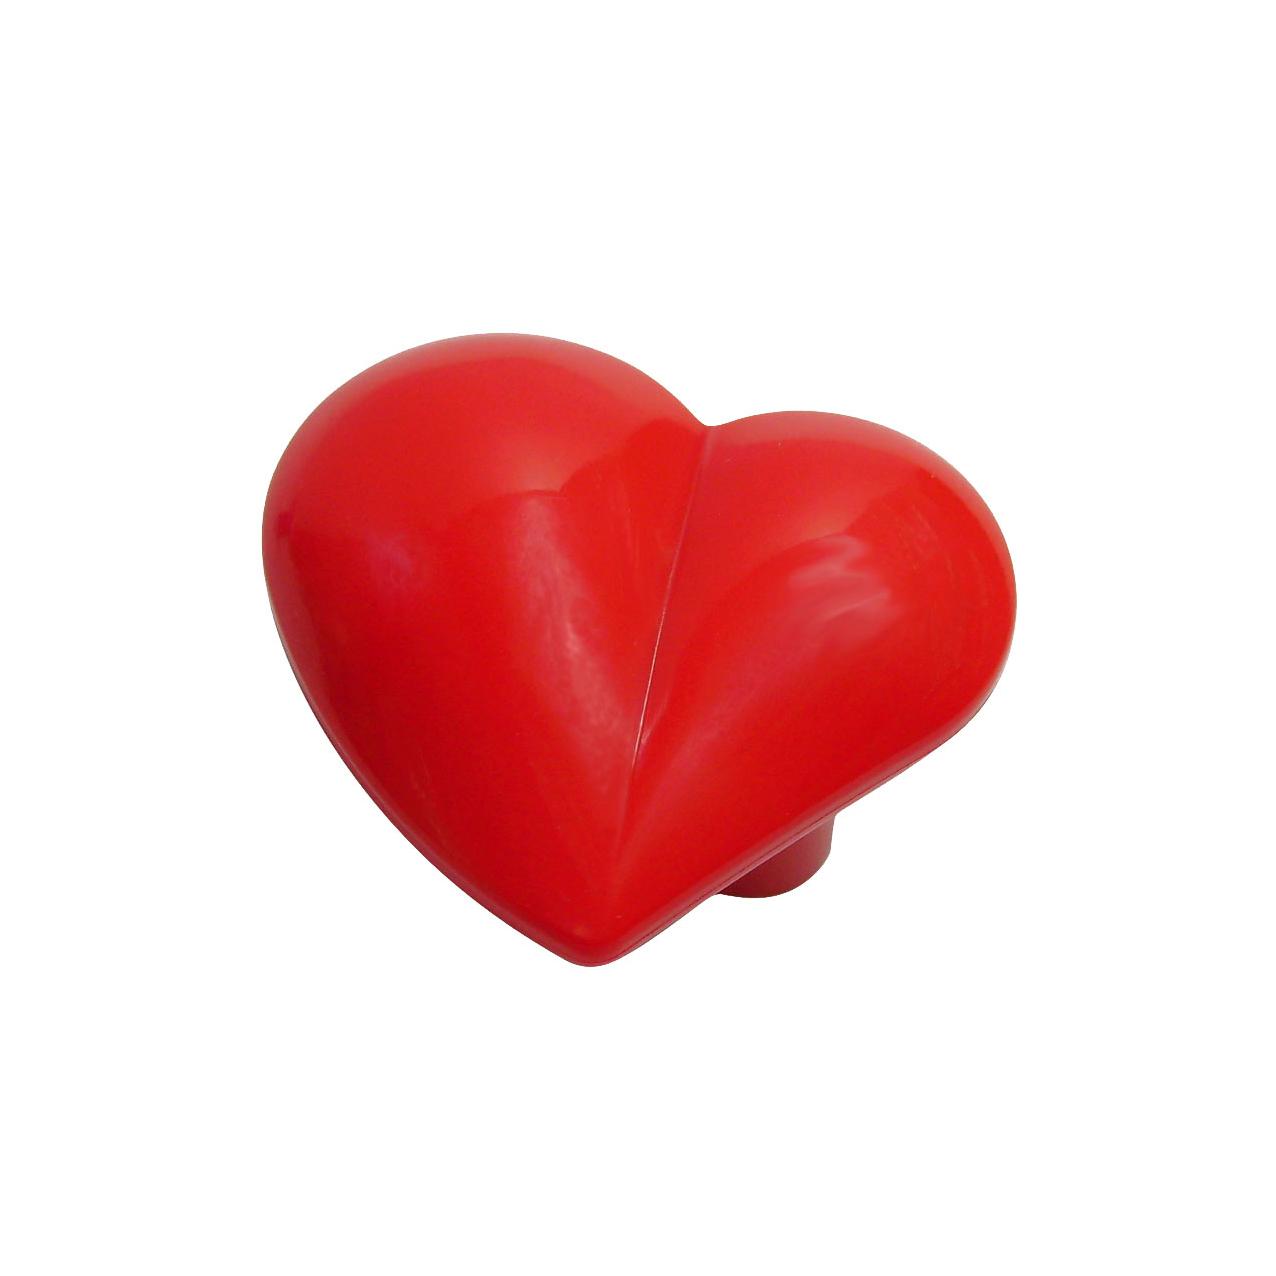 Nickelfri knopp Hjärta i kärleksfull röd färg